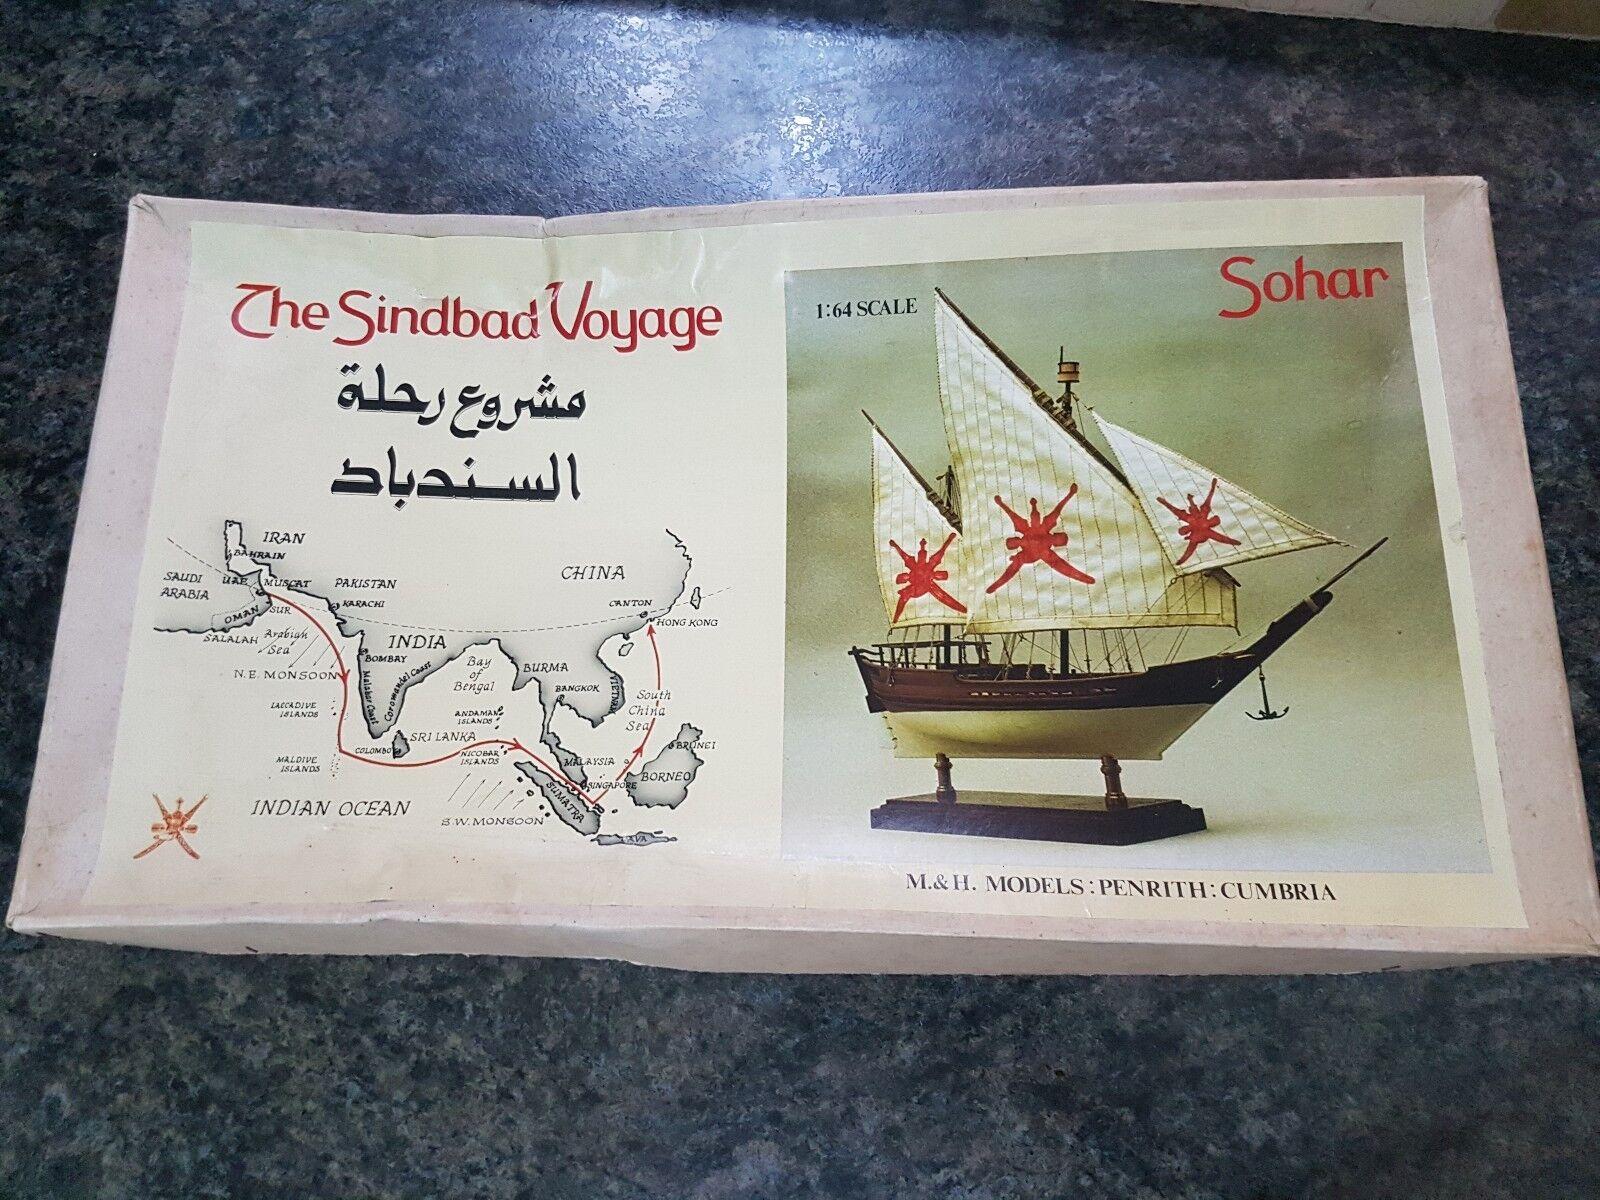 Sohar 1 64 The Sindbad Voyage Wooden Ship Great Condition Very Rare